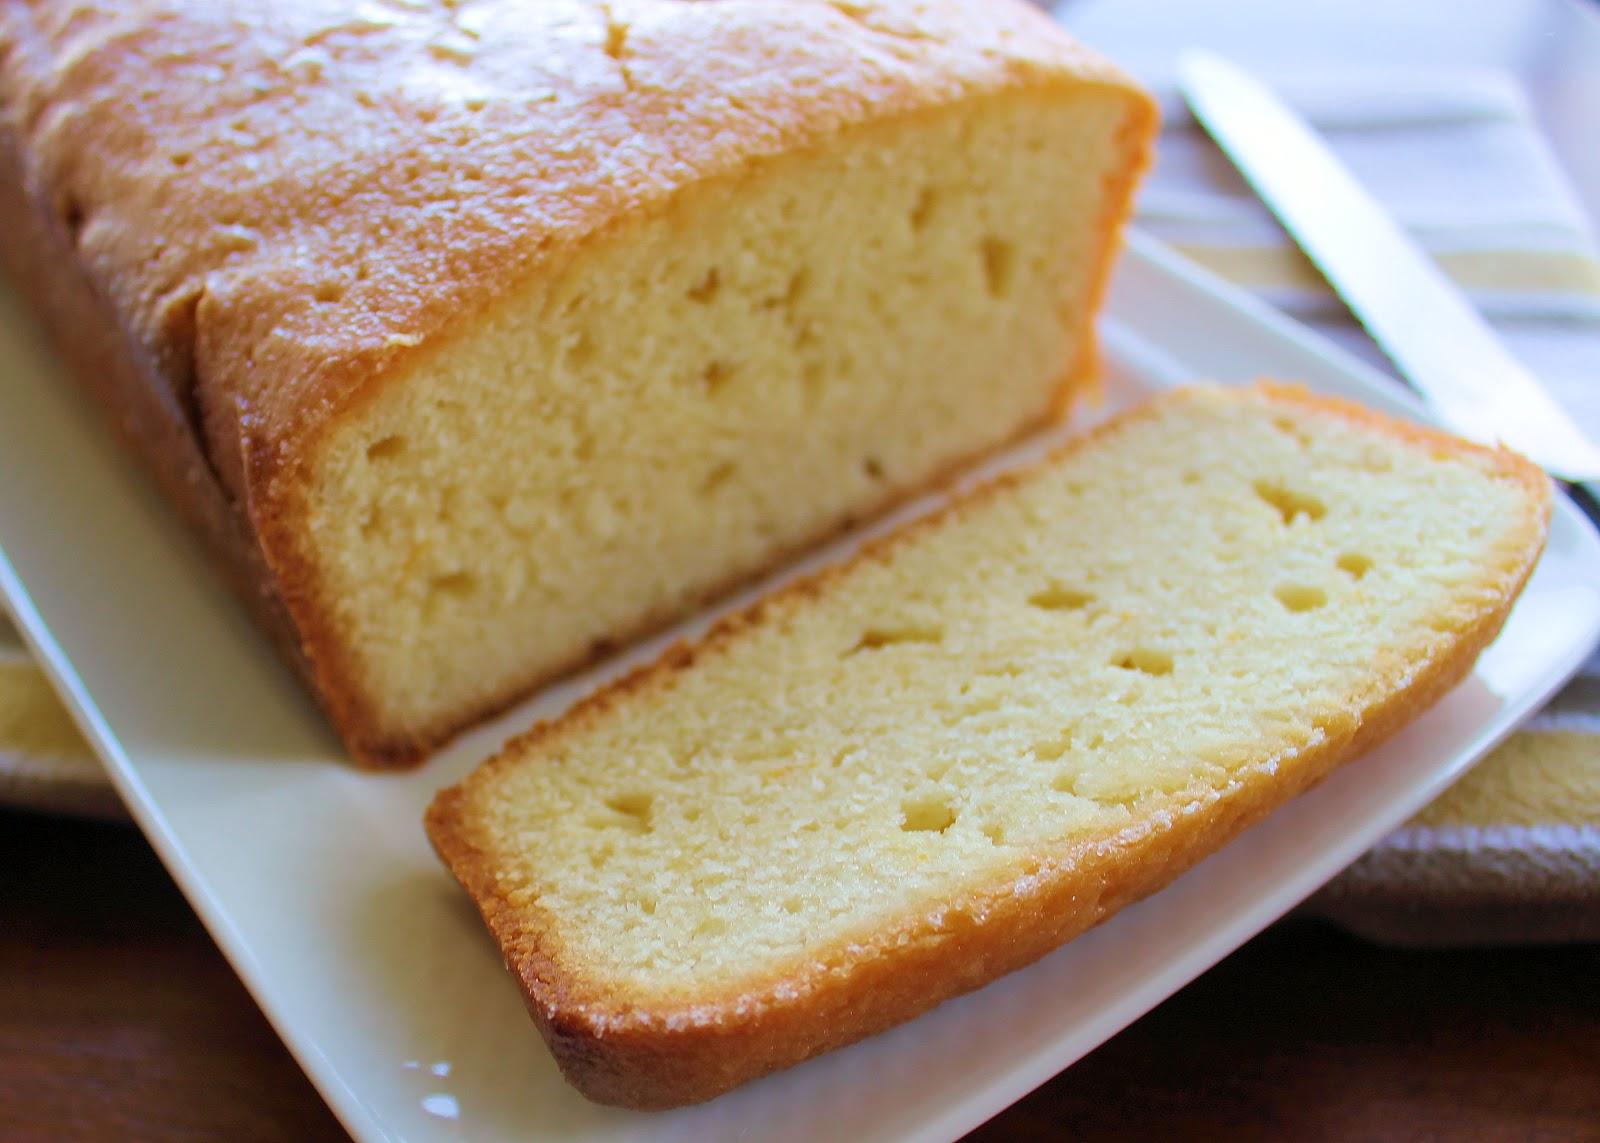 Meyer Lemon pound cake | Ingredients for a 1-pound loaf